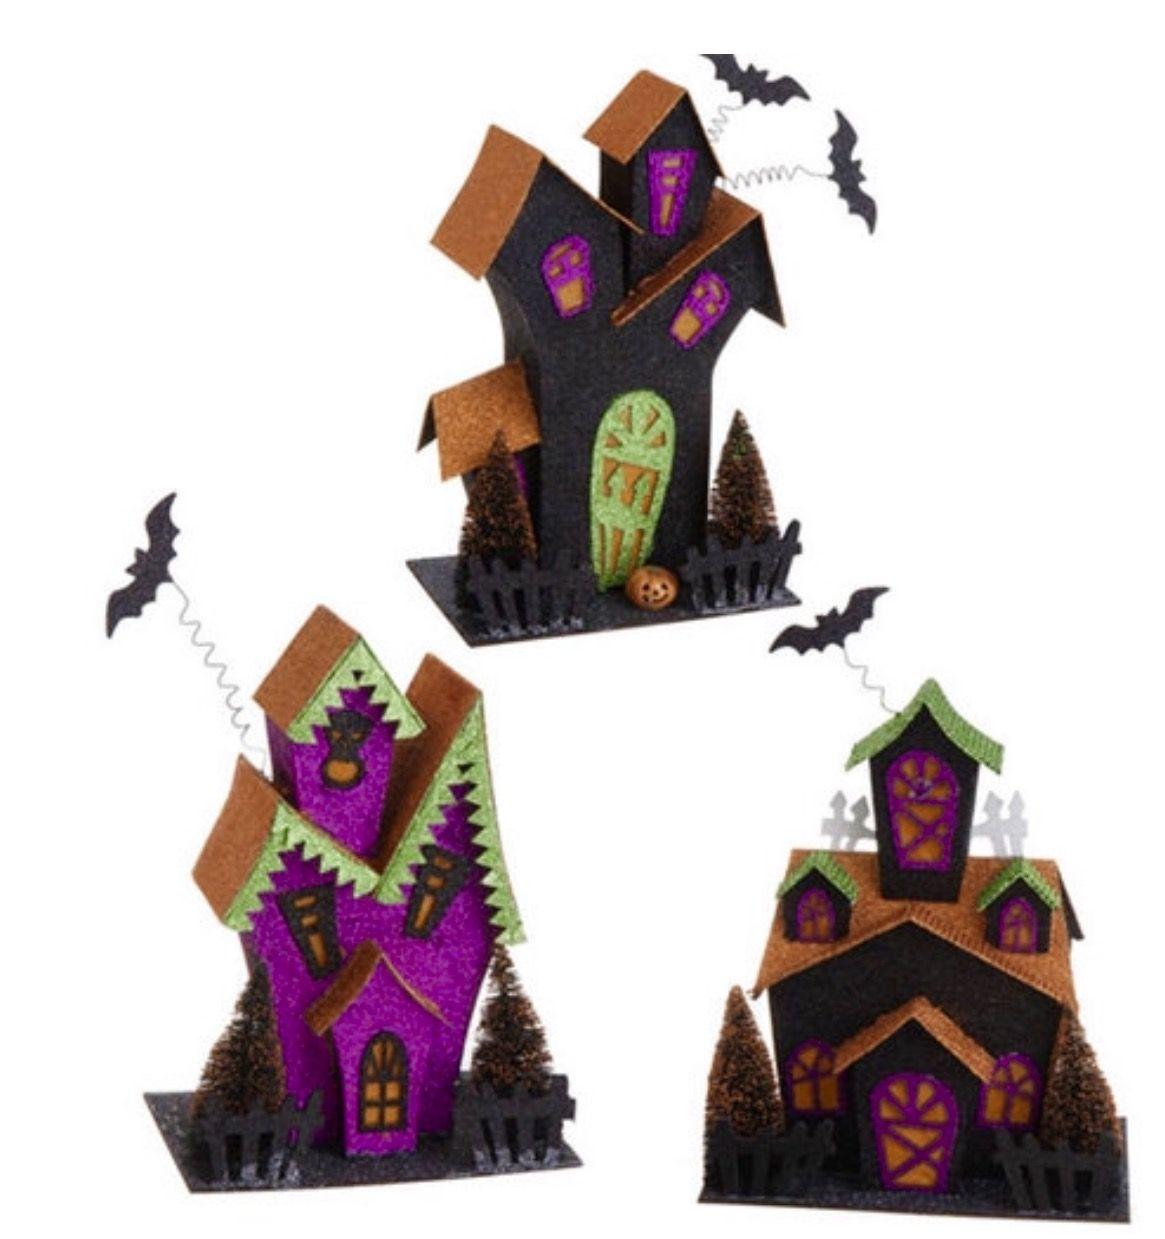 Halloween Putz Houses